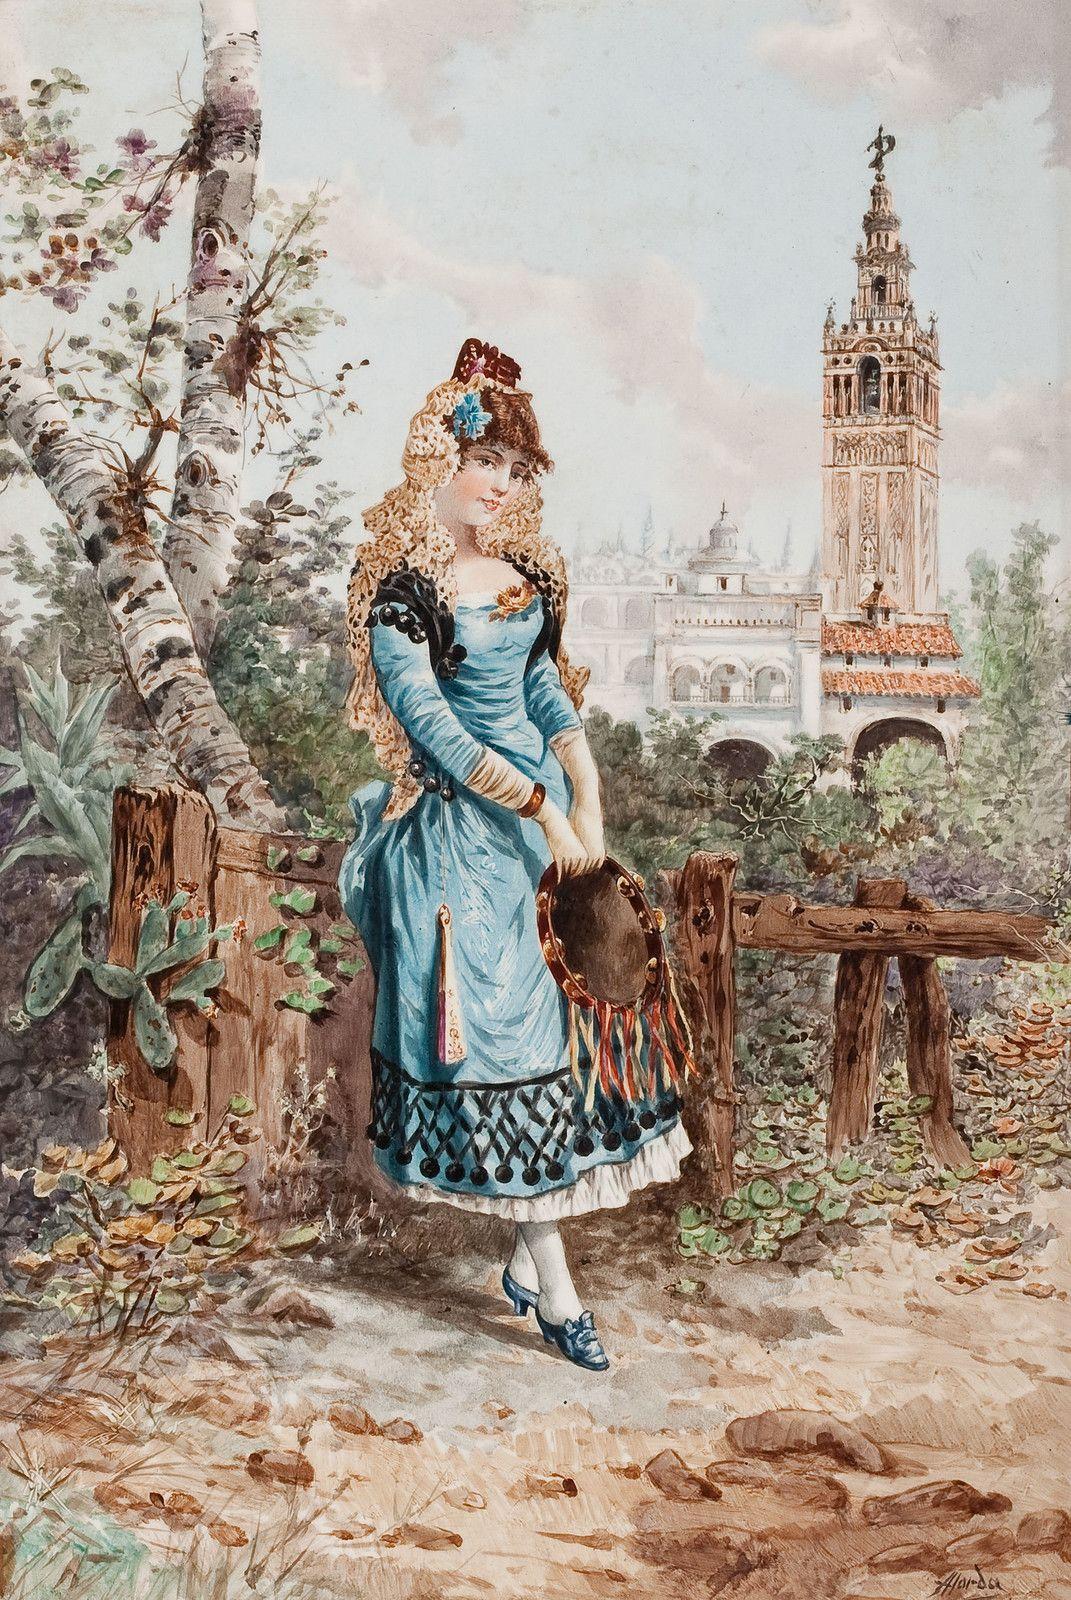 RAMON ALORDA PÉREZ (Spanish, 1848-1899) Young Spanish Woman in Cartuja Park, Seville, 1893